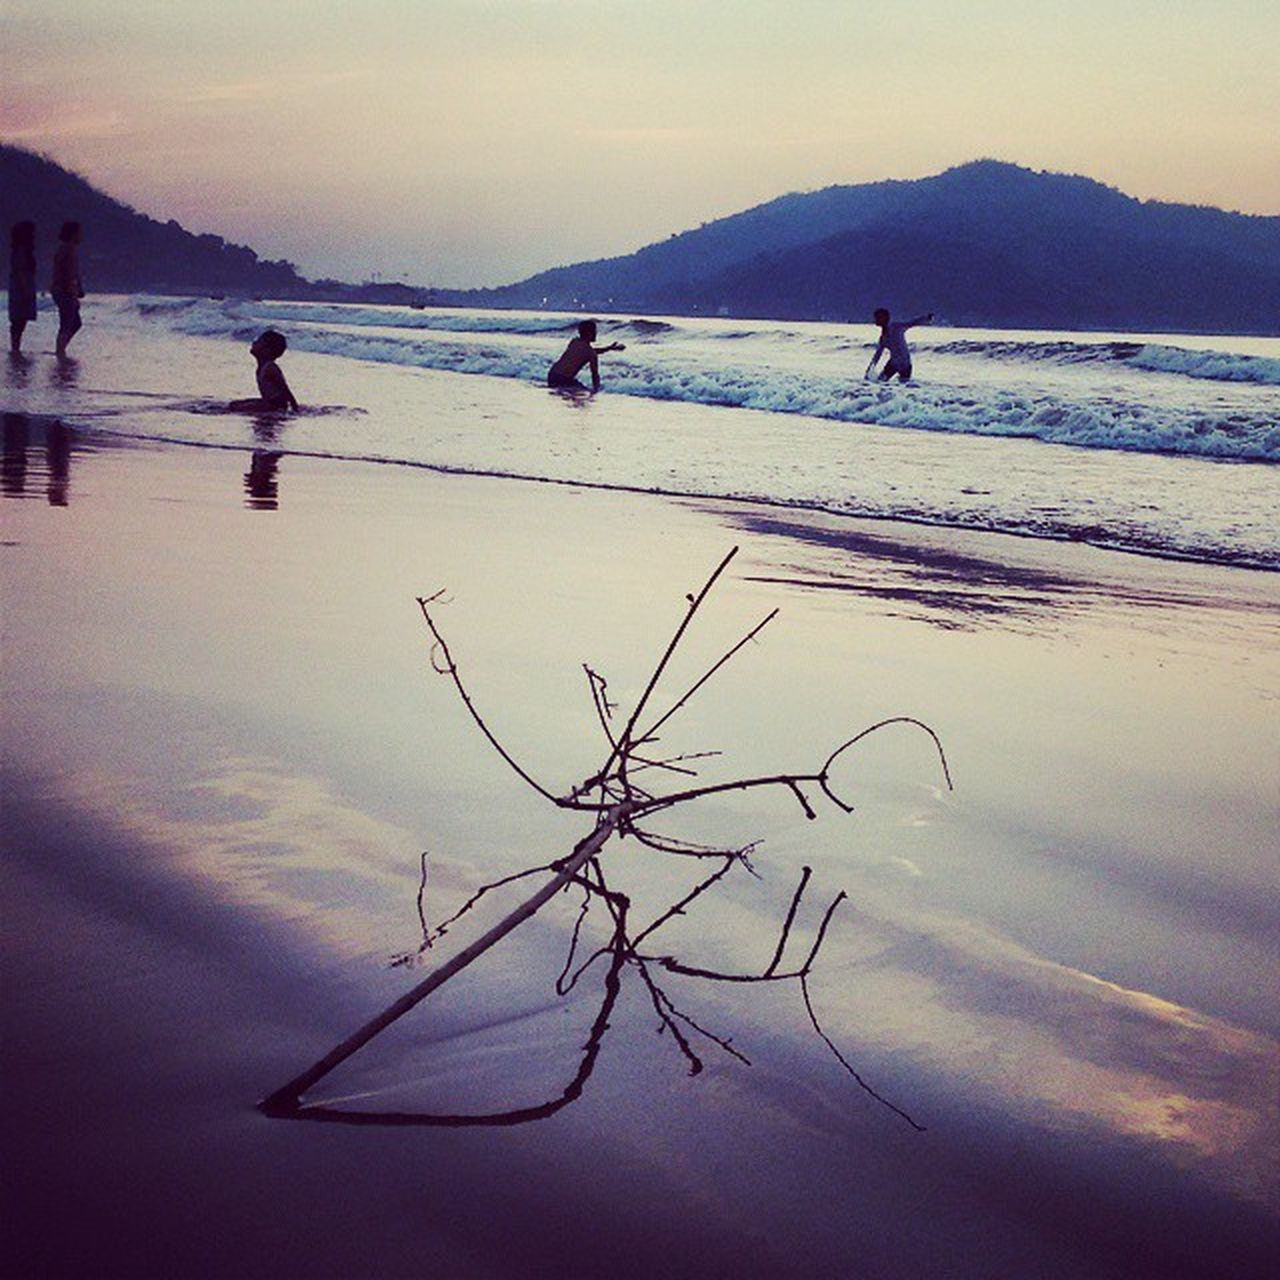 Explore Goa Love Lovethisbeach Extremely b.e.a.utiful Sooo good Already missin all the fun Wgts